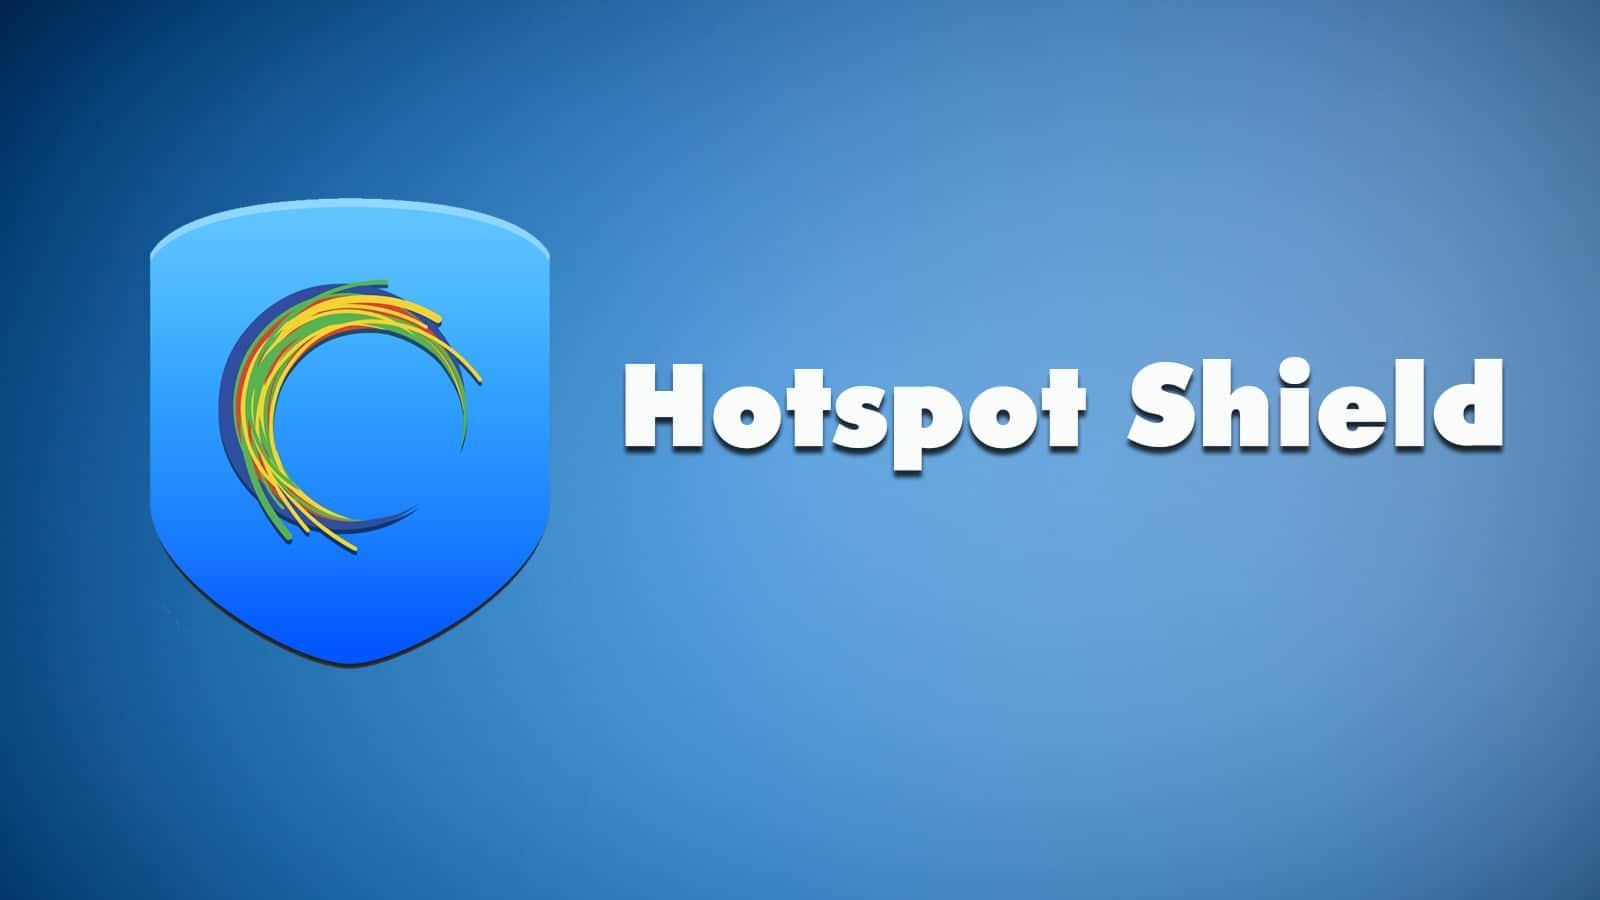 Hotspot shield 01